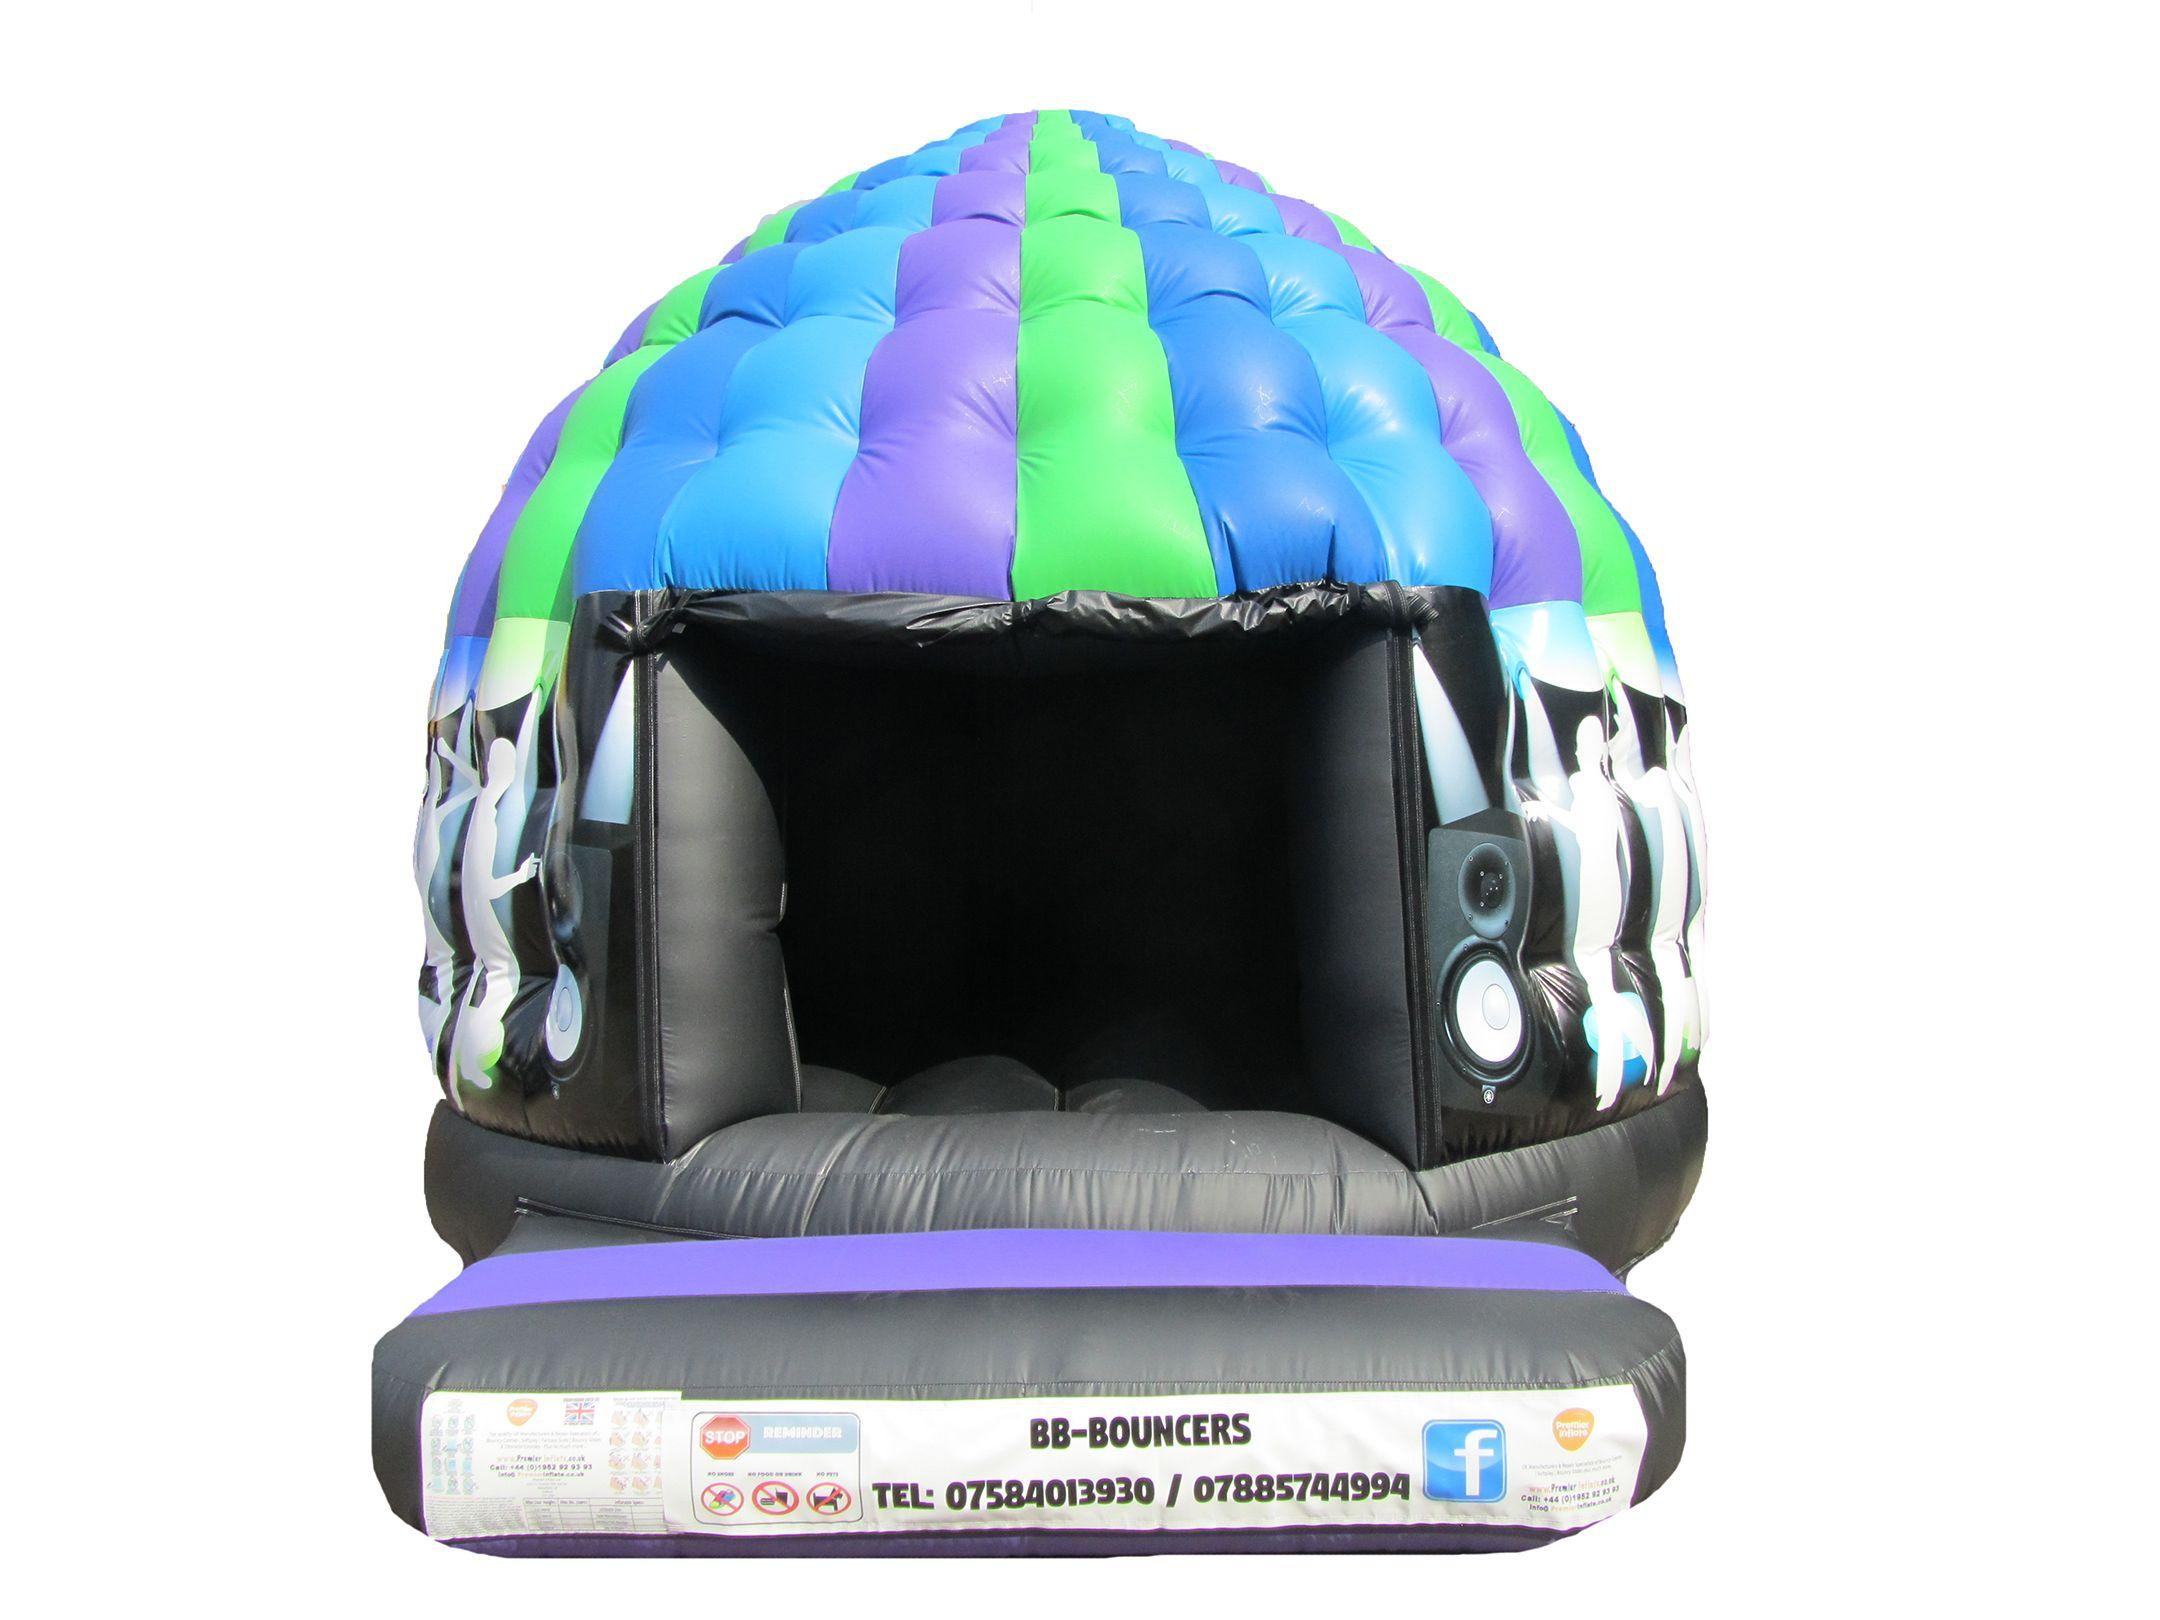 17x12 circular disco dome inflatable compressor